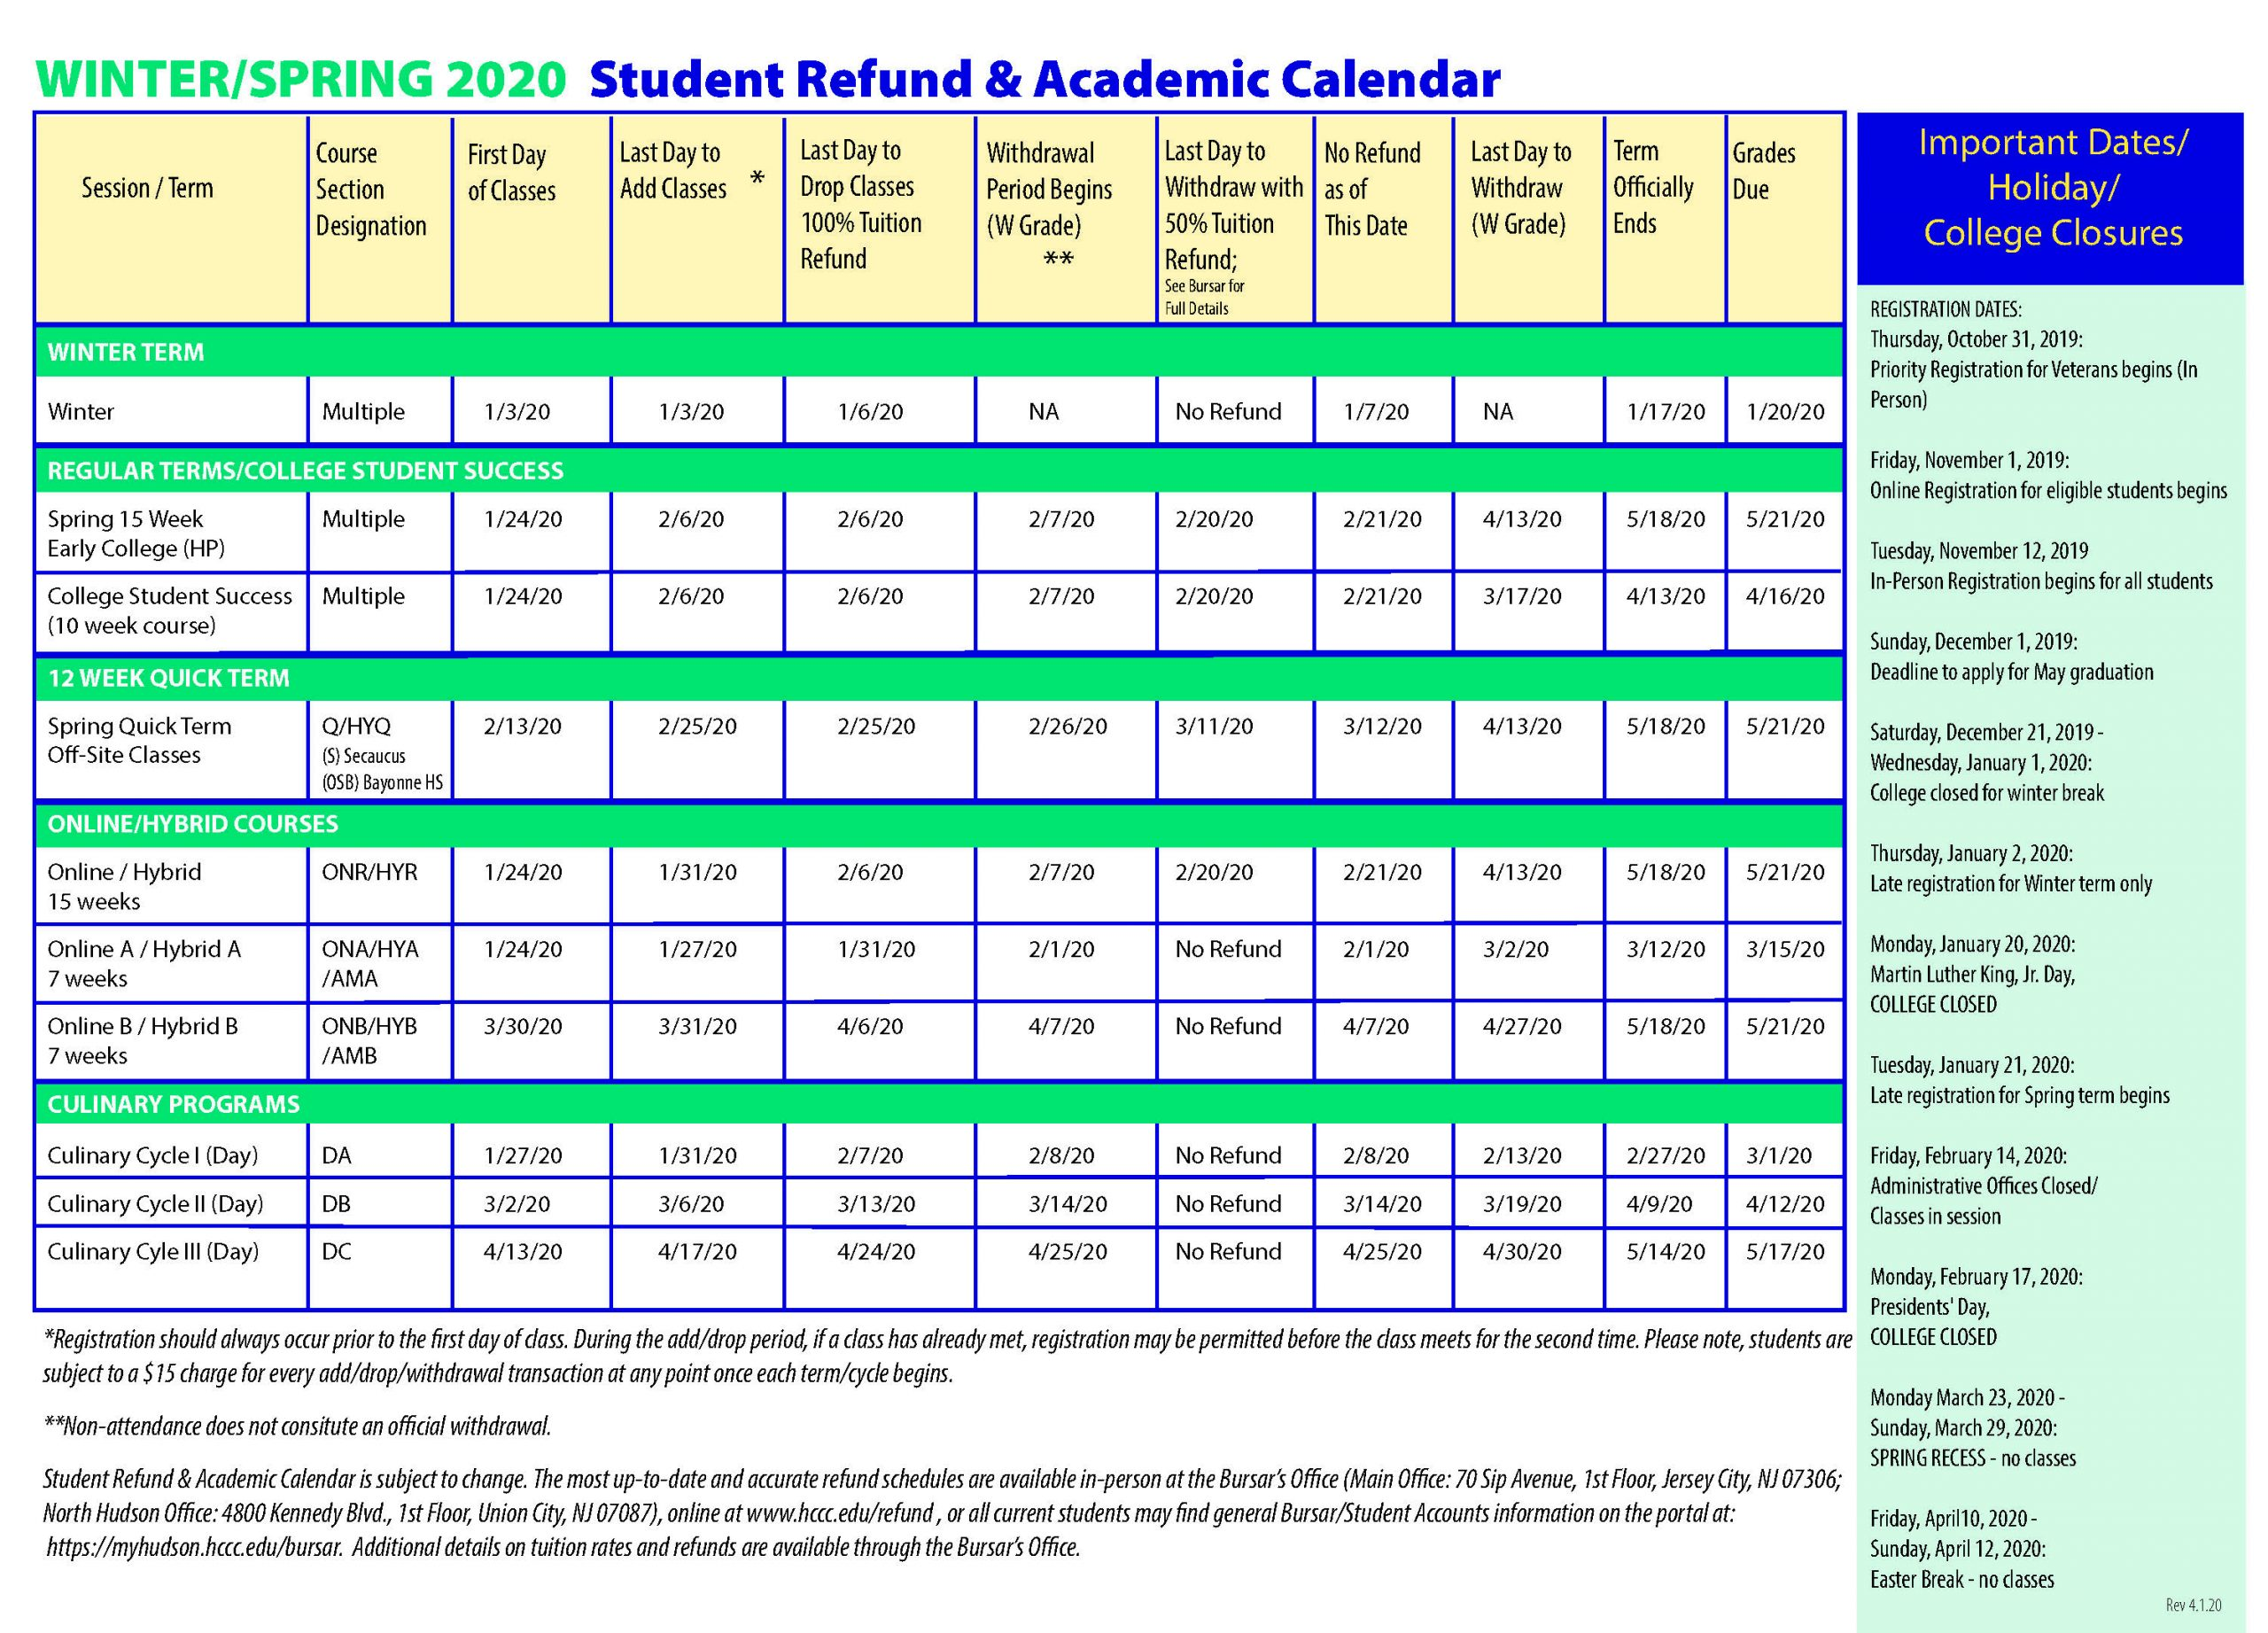 Nassau Community College Academic Calendar Spring 2020 Pertaining To Bay County School Calendar 2020/2021